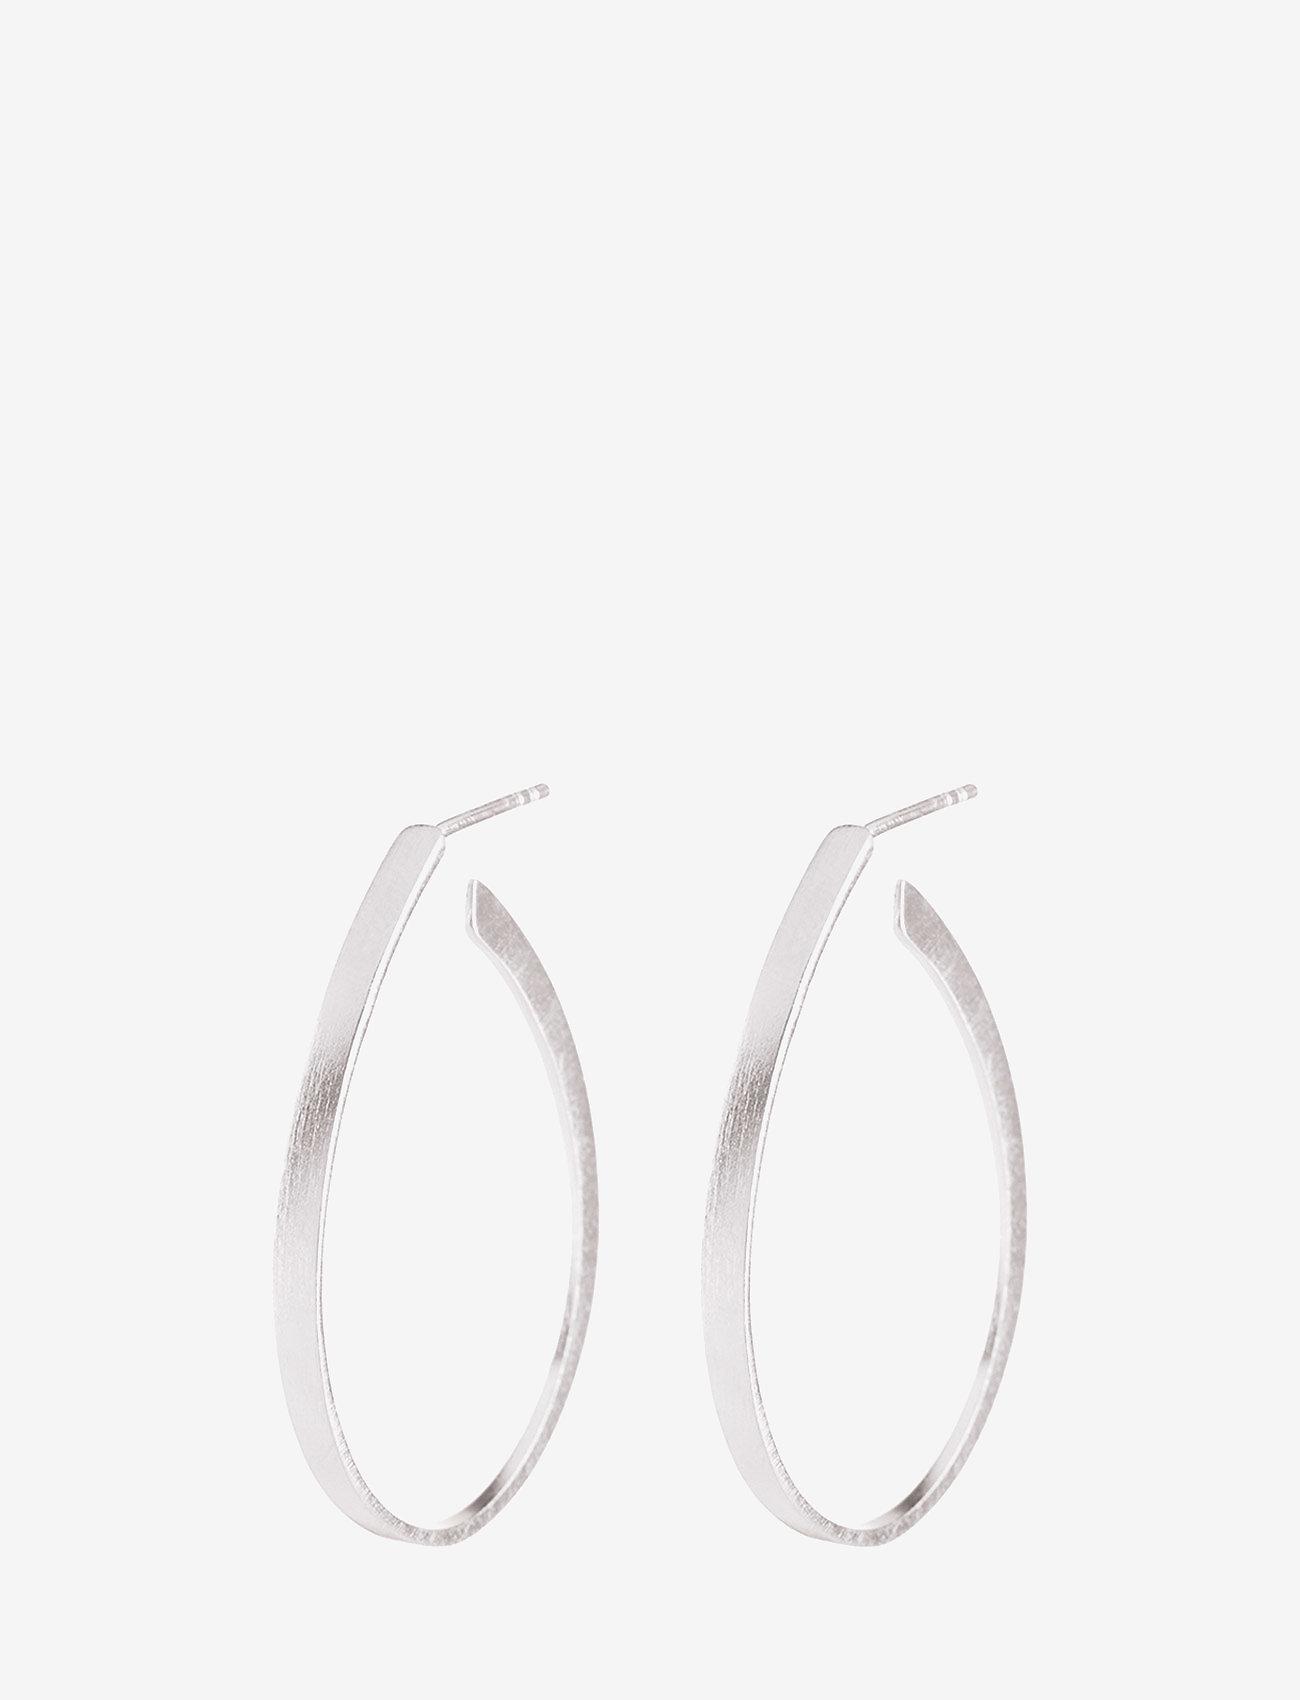 Pernille Corydon - Oval Creoles  size 35 mm - statement earrings - silver - 0